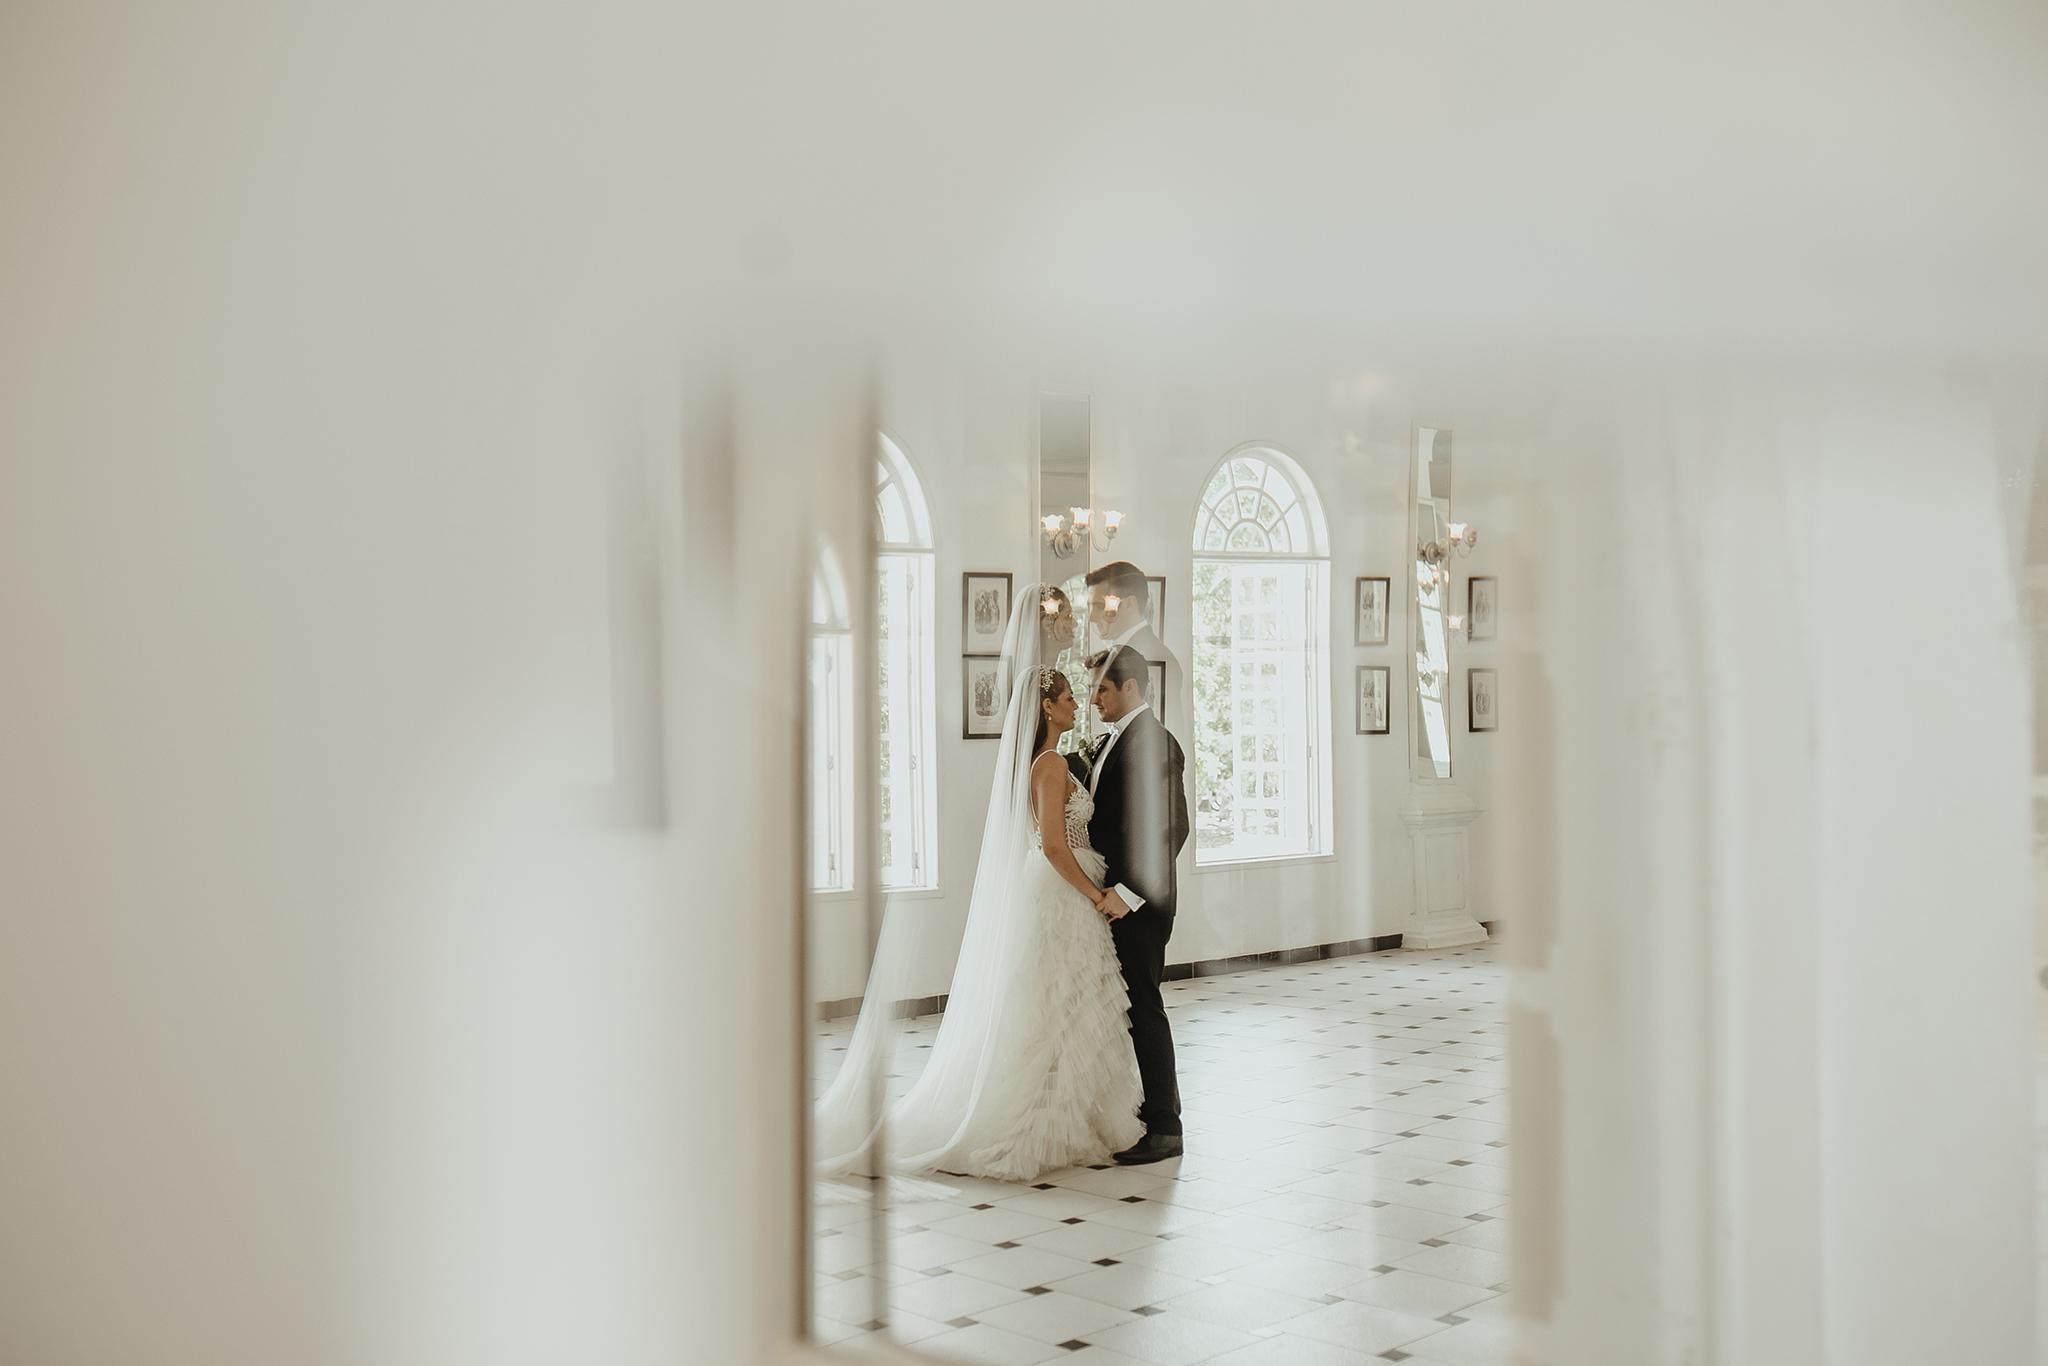 0406R&F__WeddingDestination_Weddingmerida_BodaMexico_FotografoDeBodas_FabrizioSimoneenFotografo.jpg